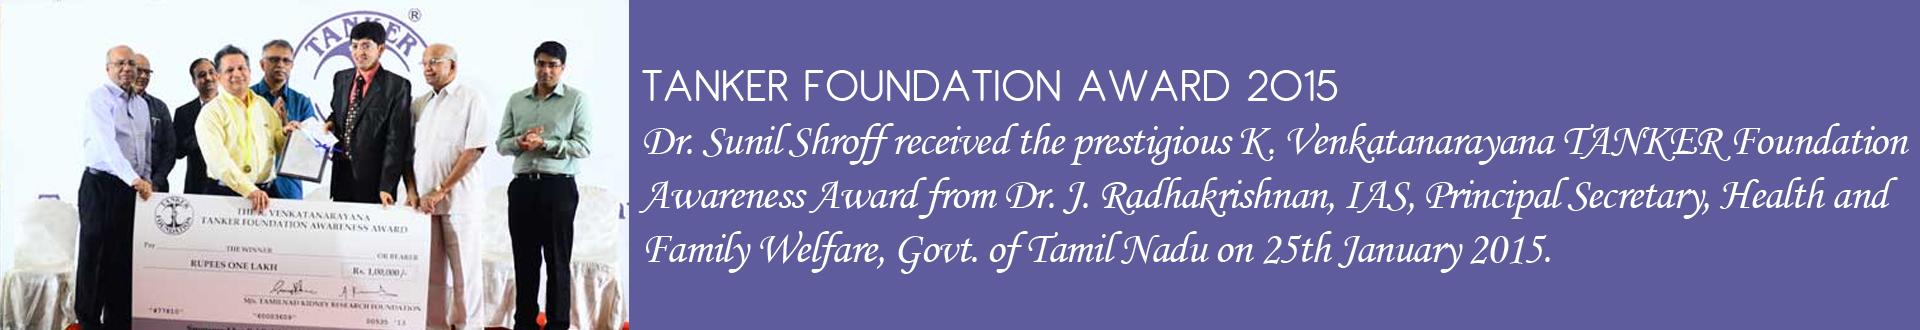 TANKER FOUNDATION AWARD 2015